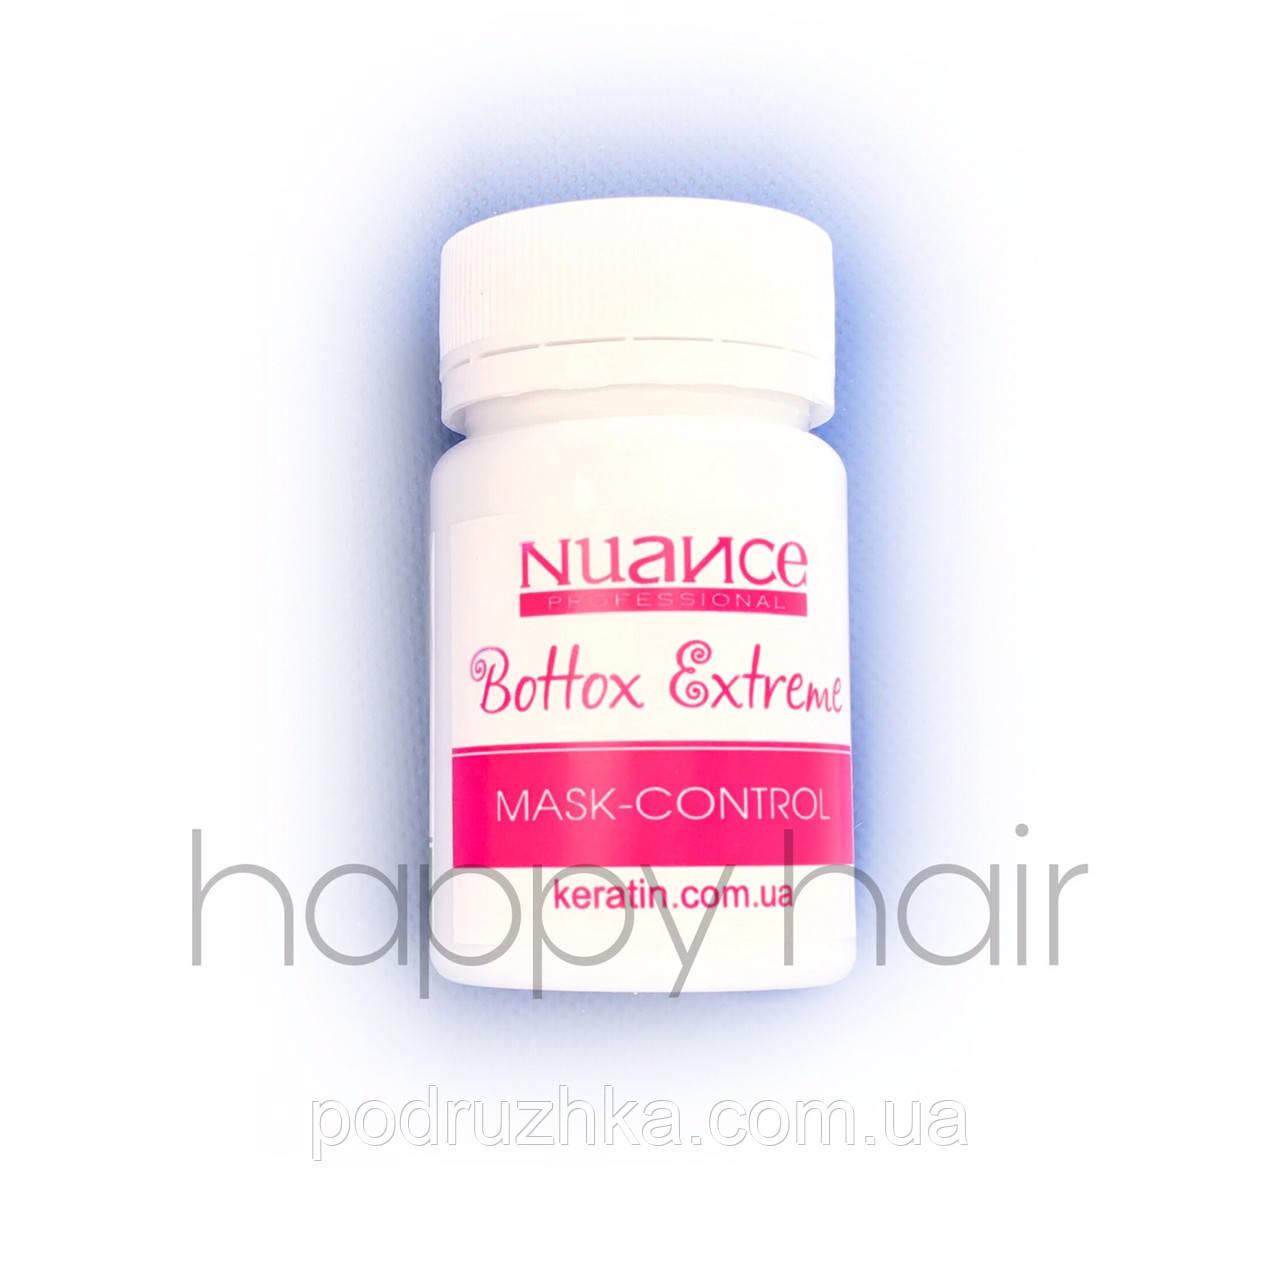 Nuance Bottox Extreme Control Ботокс для волос 50 г